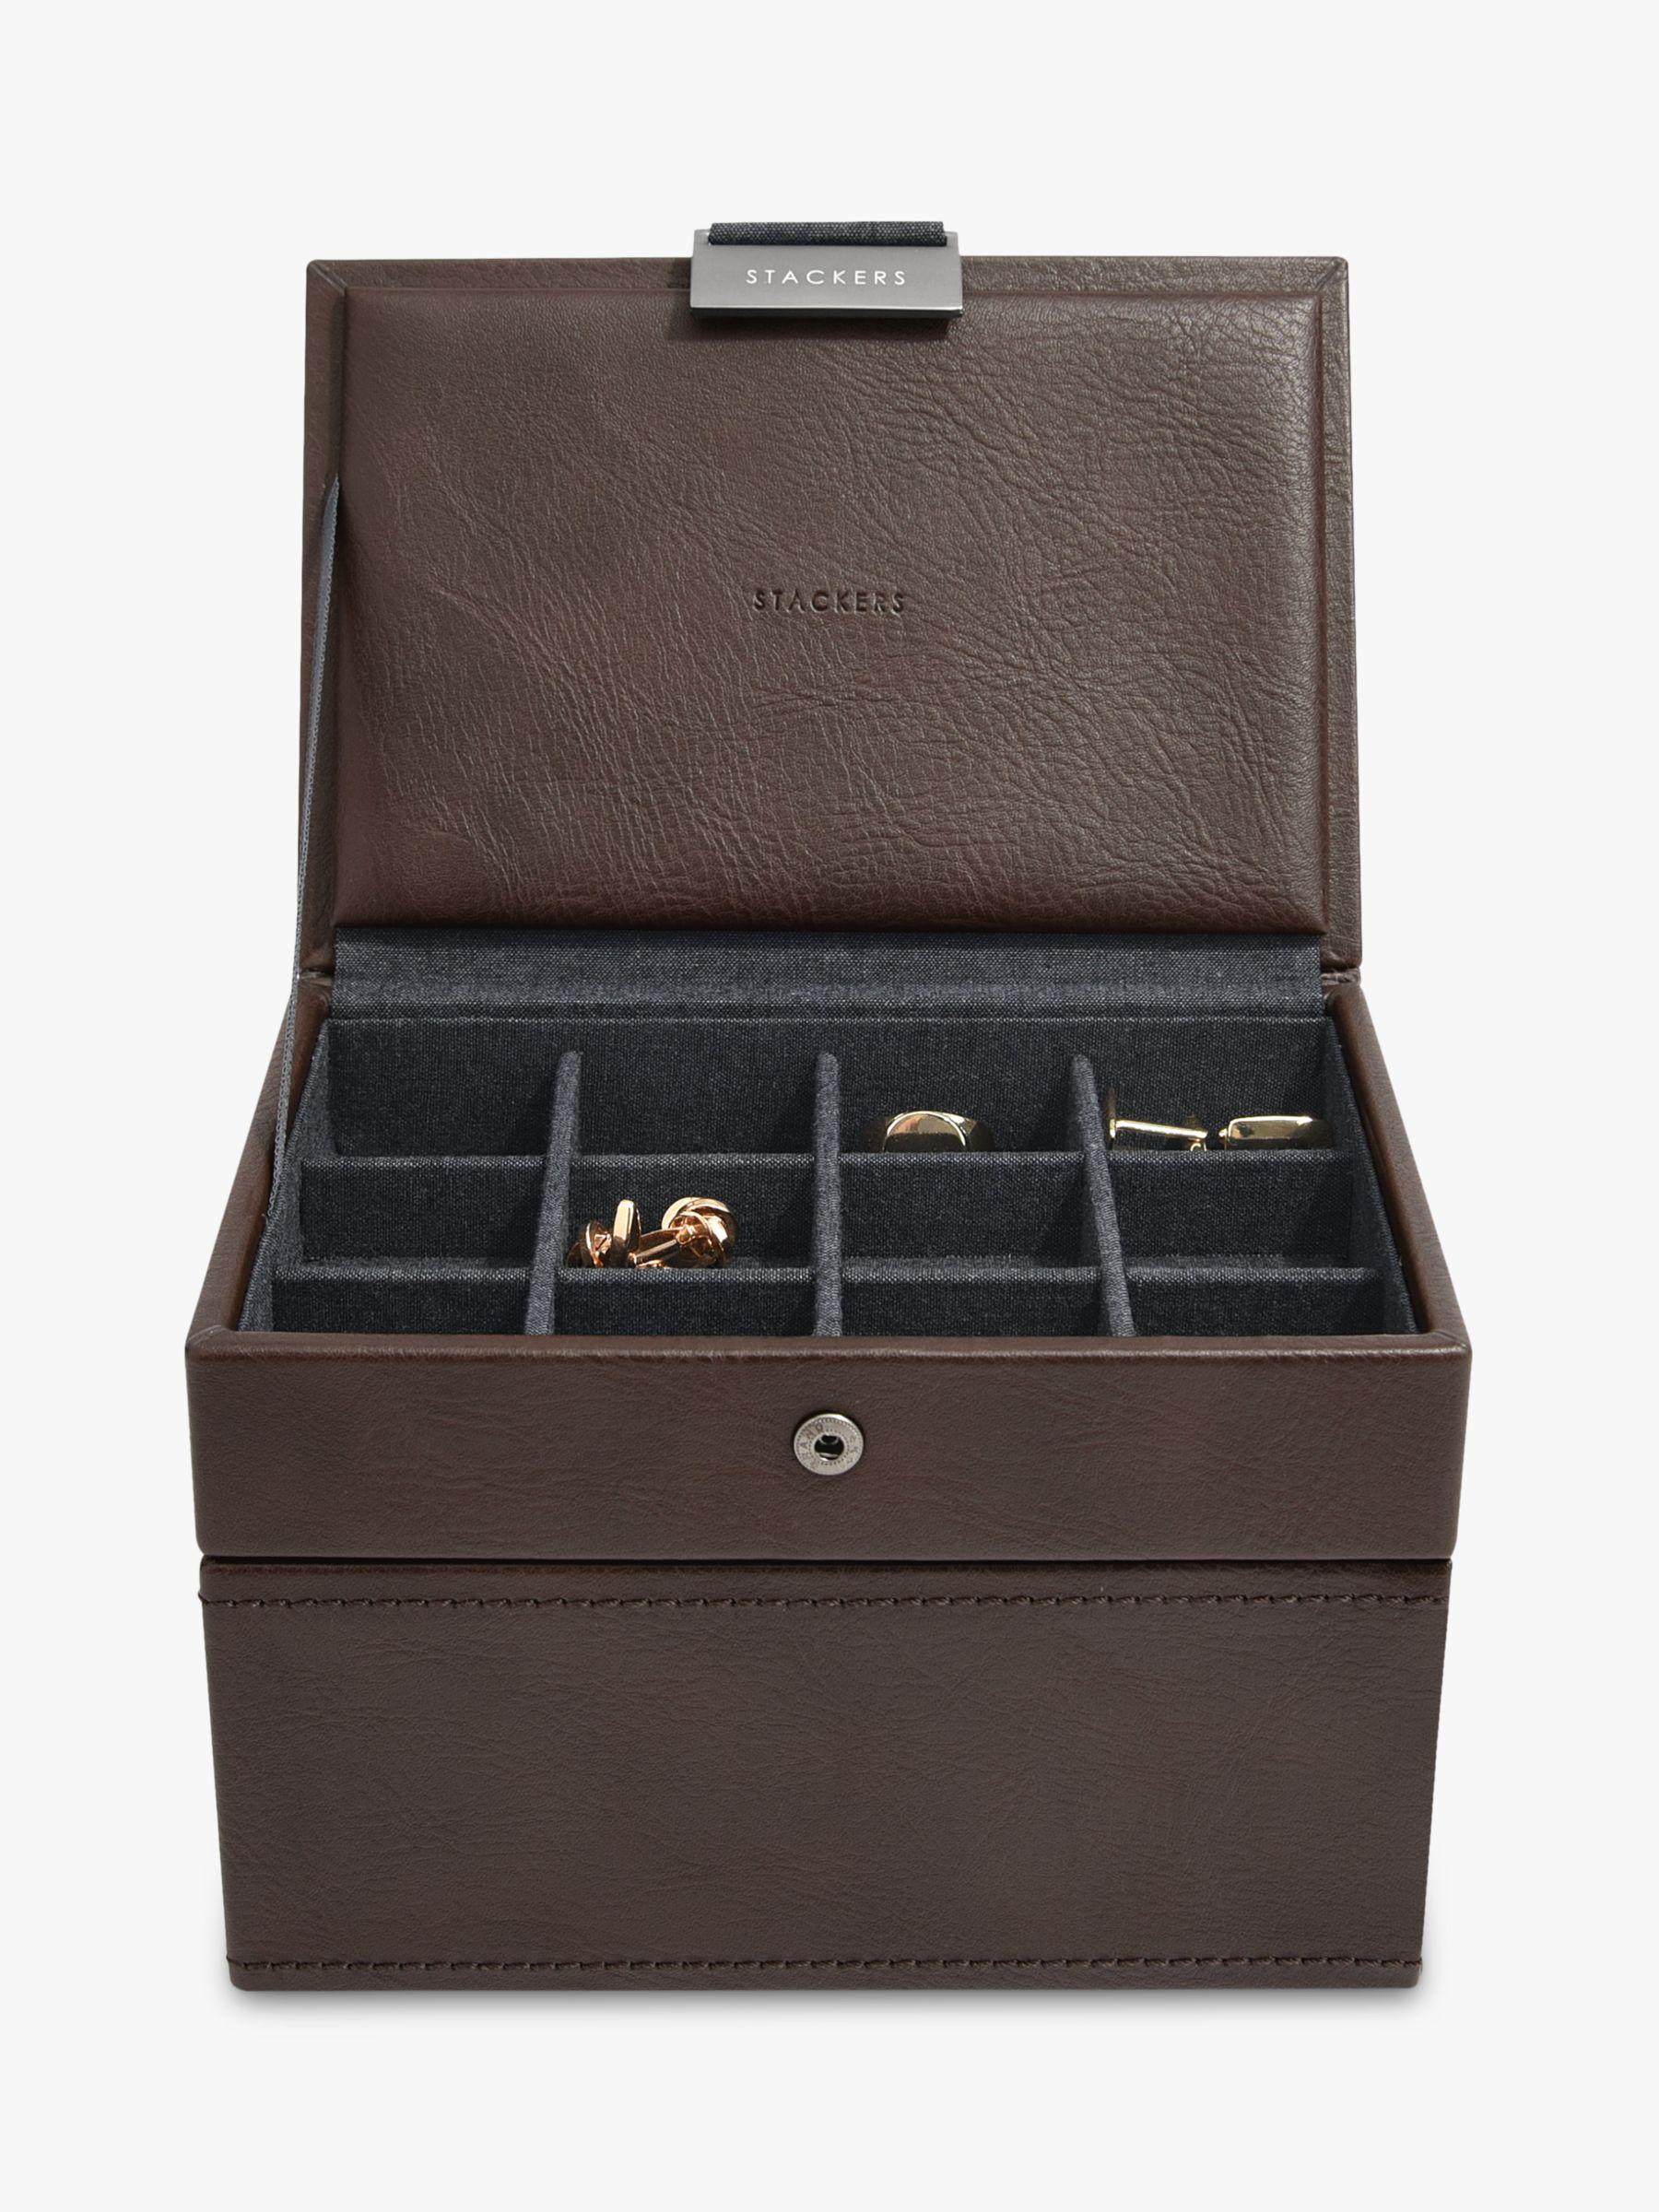 Stackers Stackers Men's Mini Watch & Cufflink Box